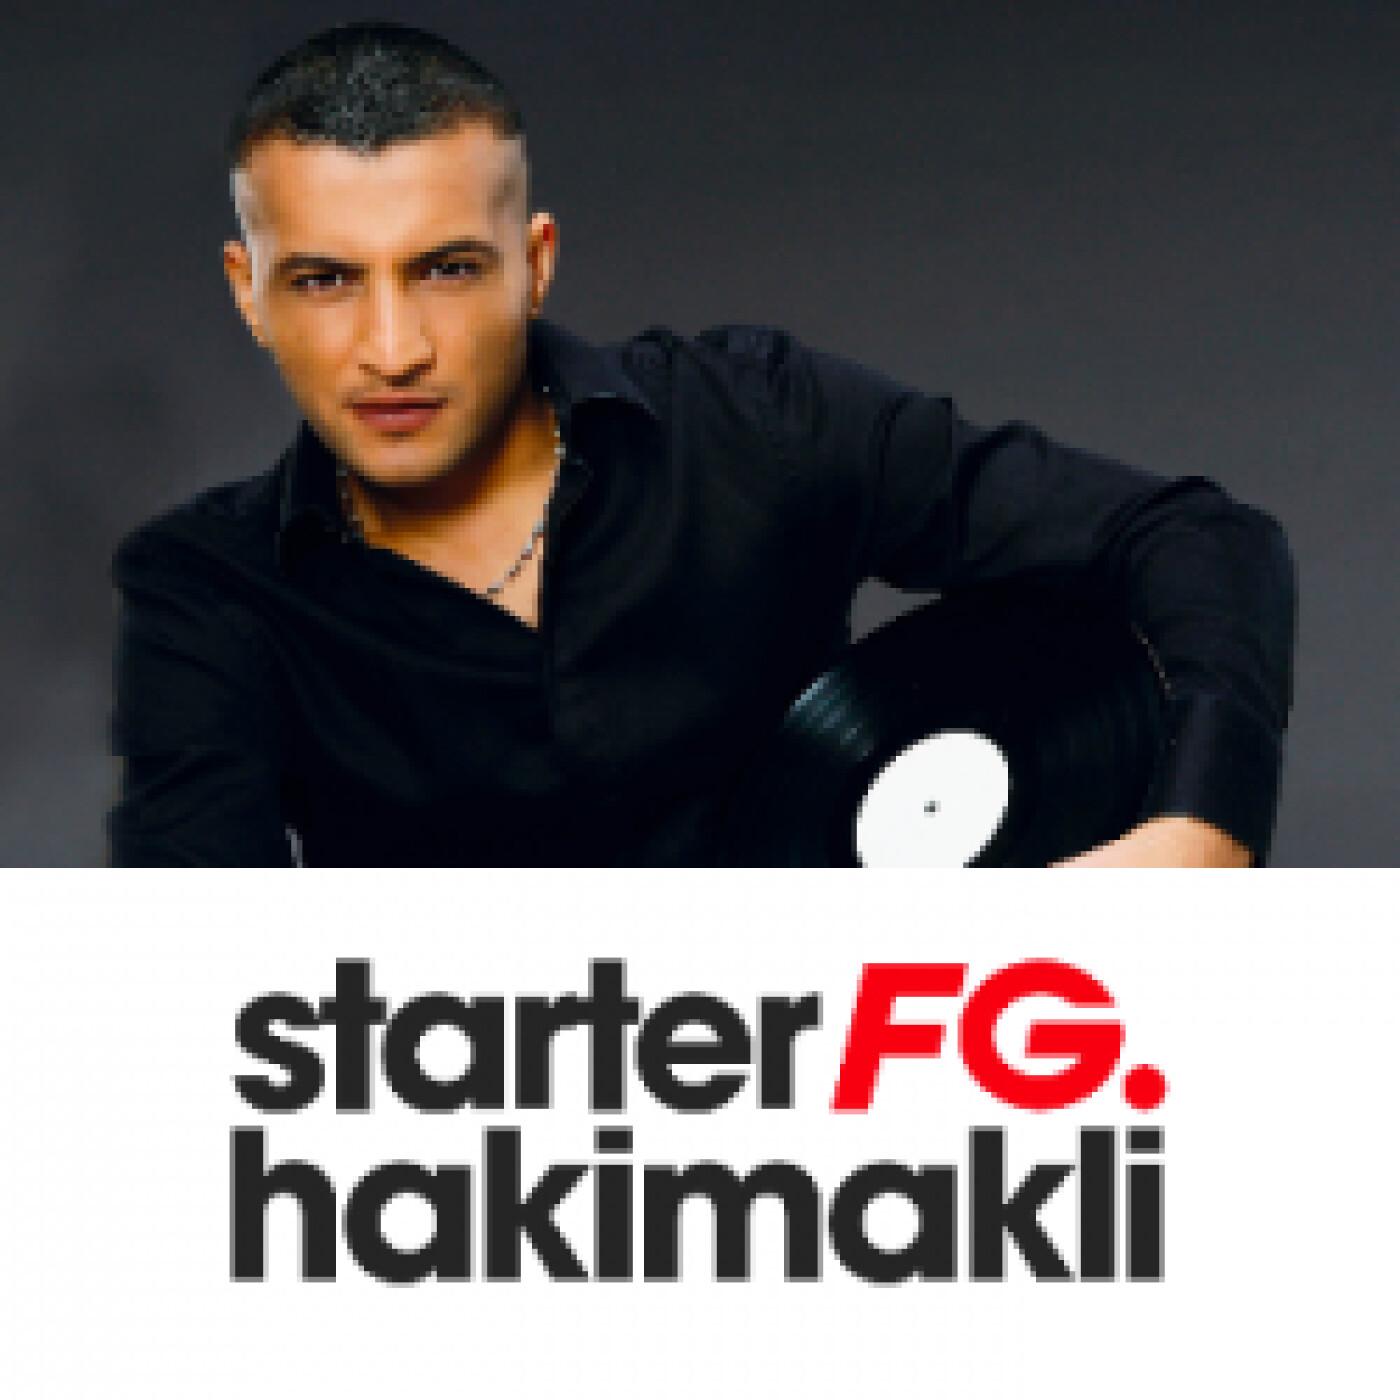 STARTER FG BY HAKIMAKLI MERCREDI 17 FEVRIER 2021